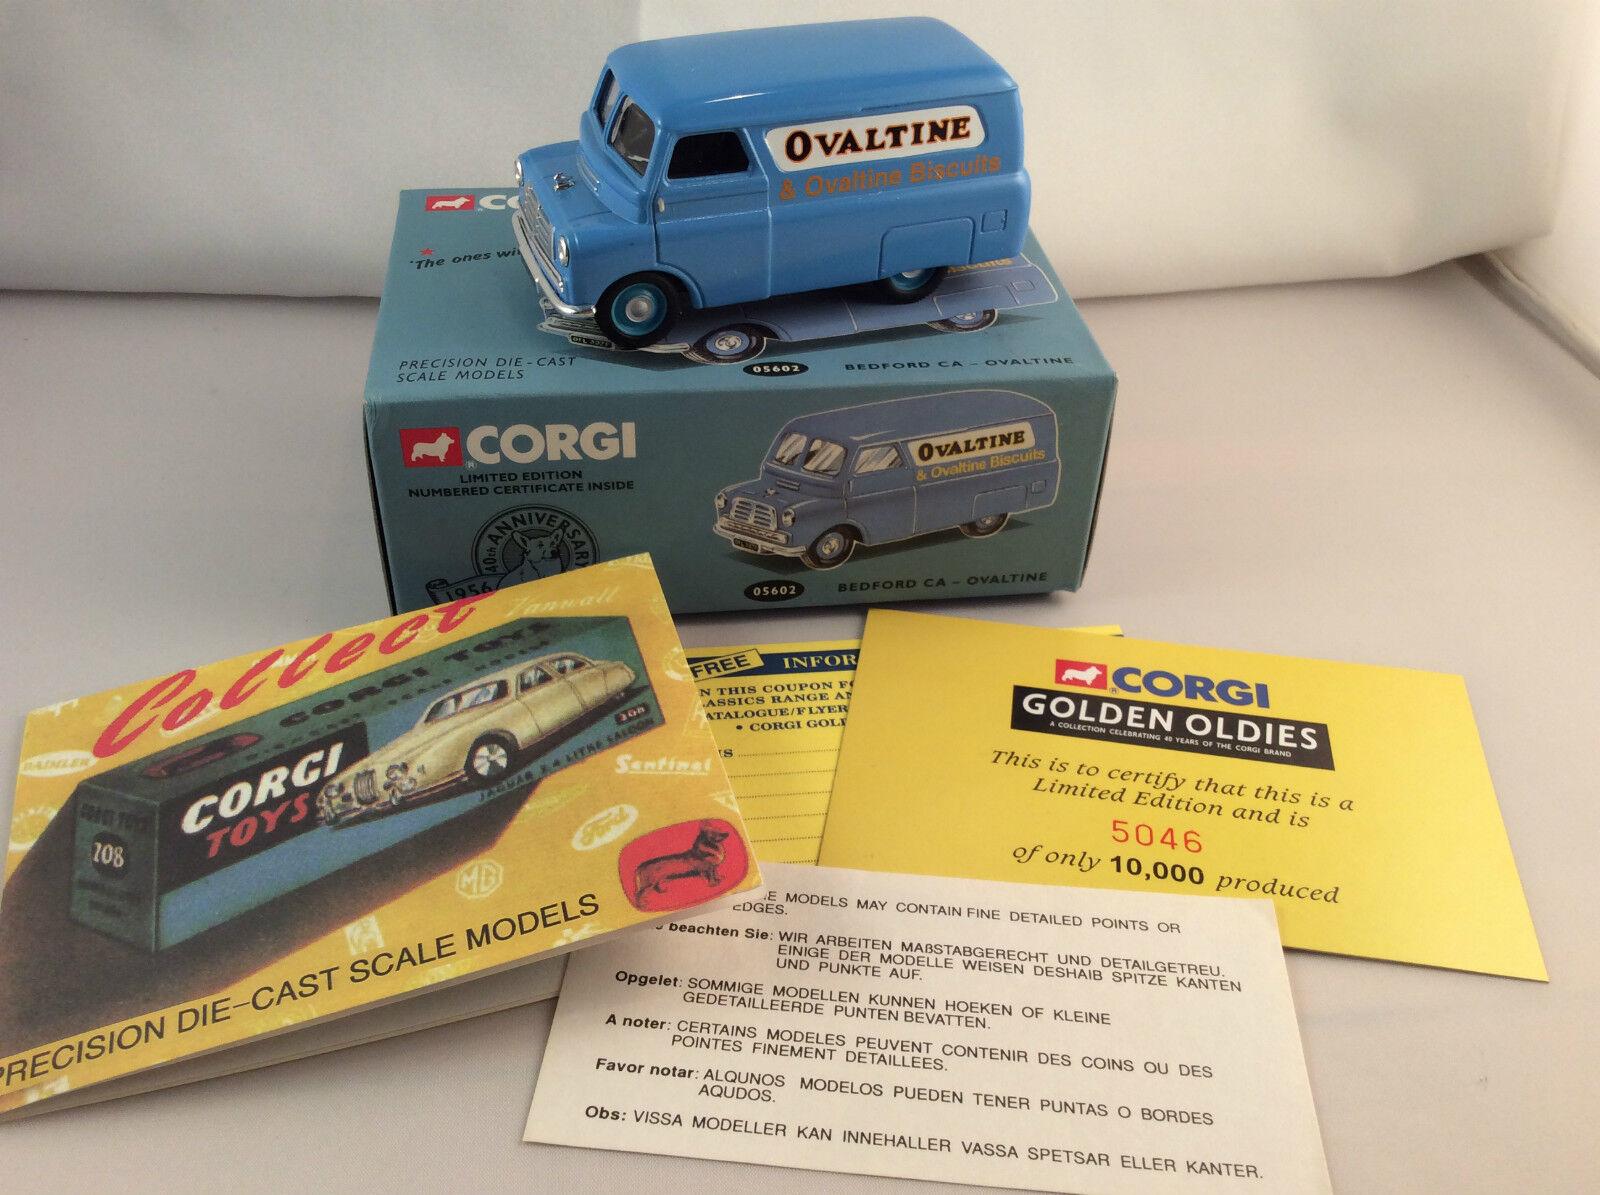 Corgi Toys Classics golden Oldies Bedford CA Ovaltine ovp Limited Edition